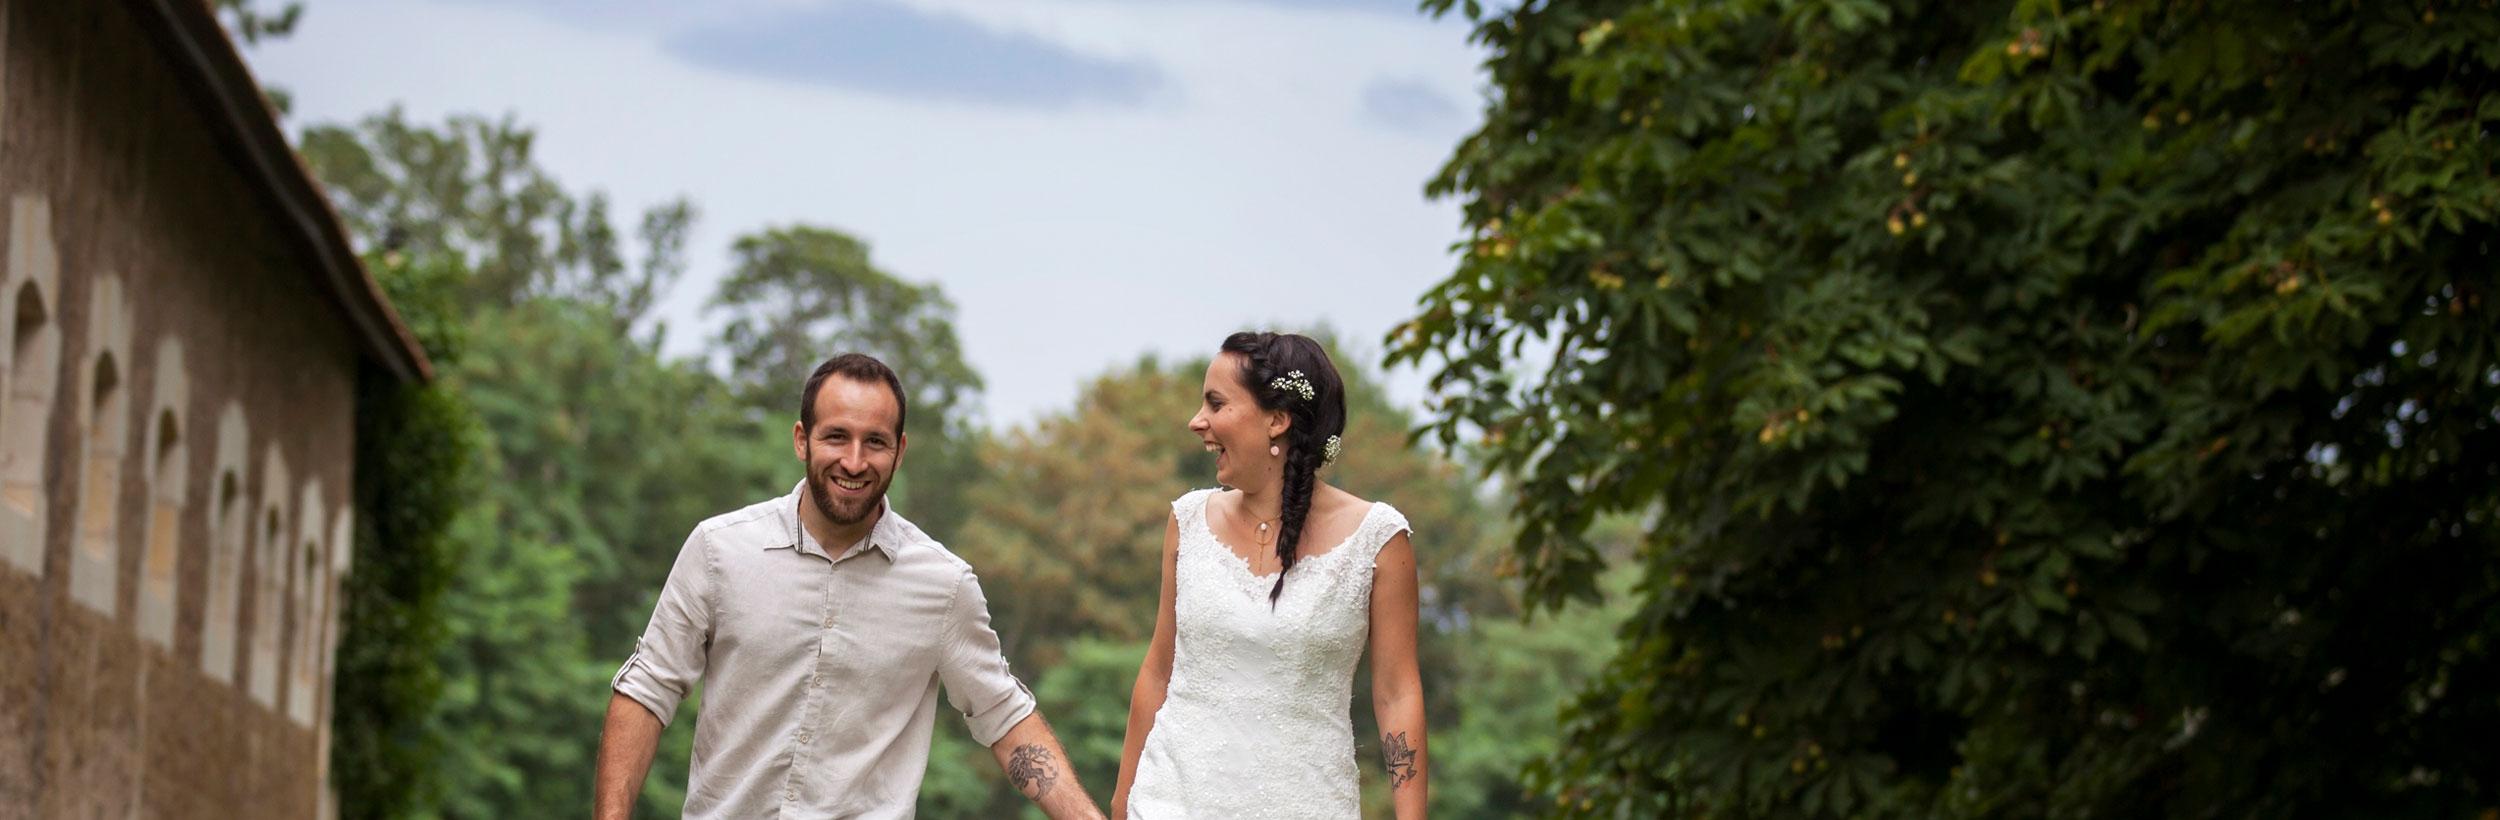 mariage-carla-jeremy-pagetop